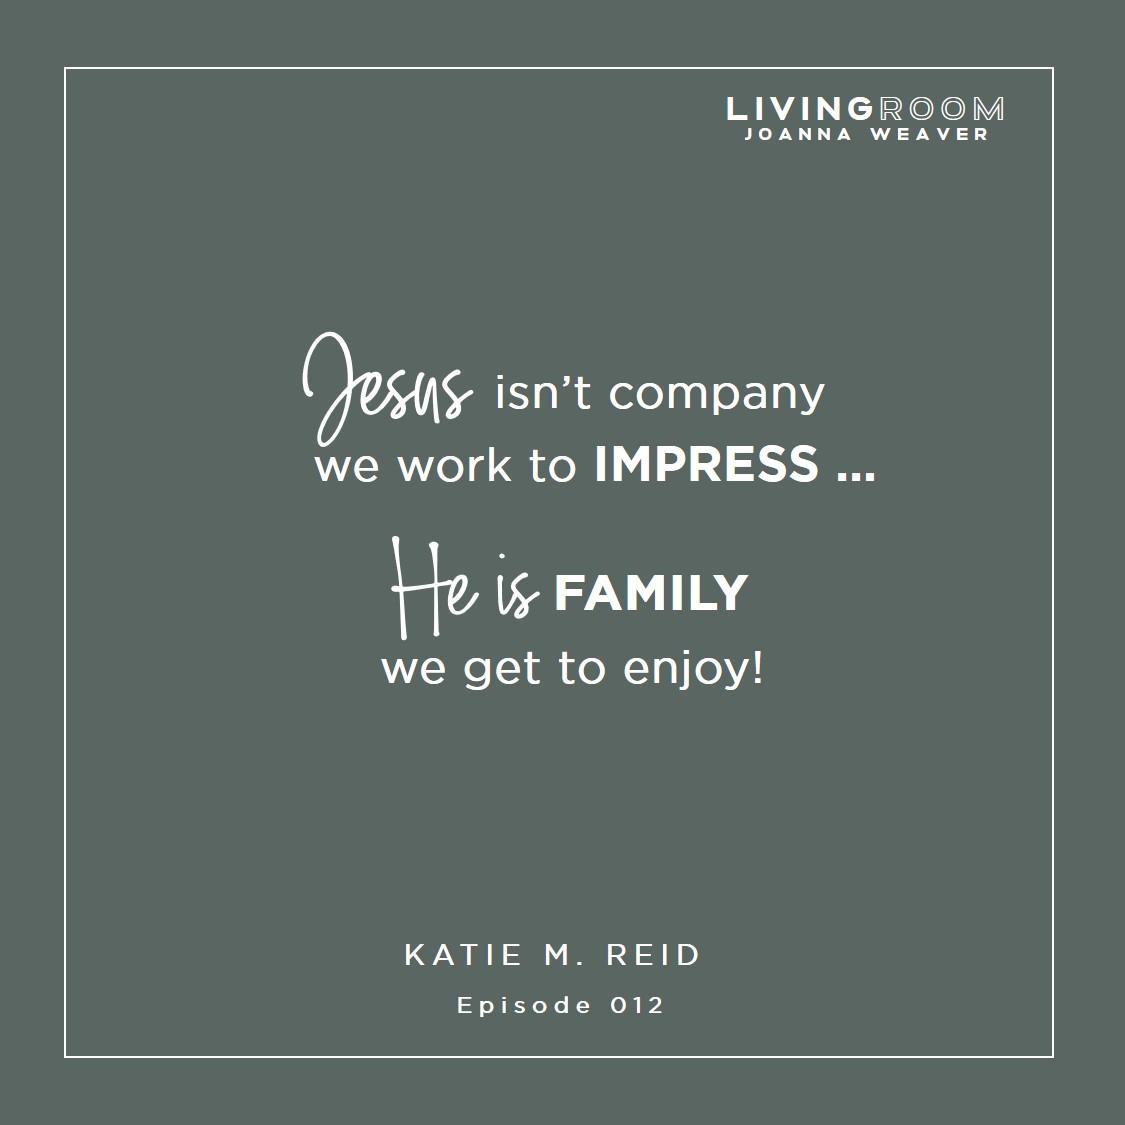 """Jesus isn't company we work to impress...He is family we get to enjoy!"" Katie M. Reid - TLR 012"